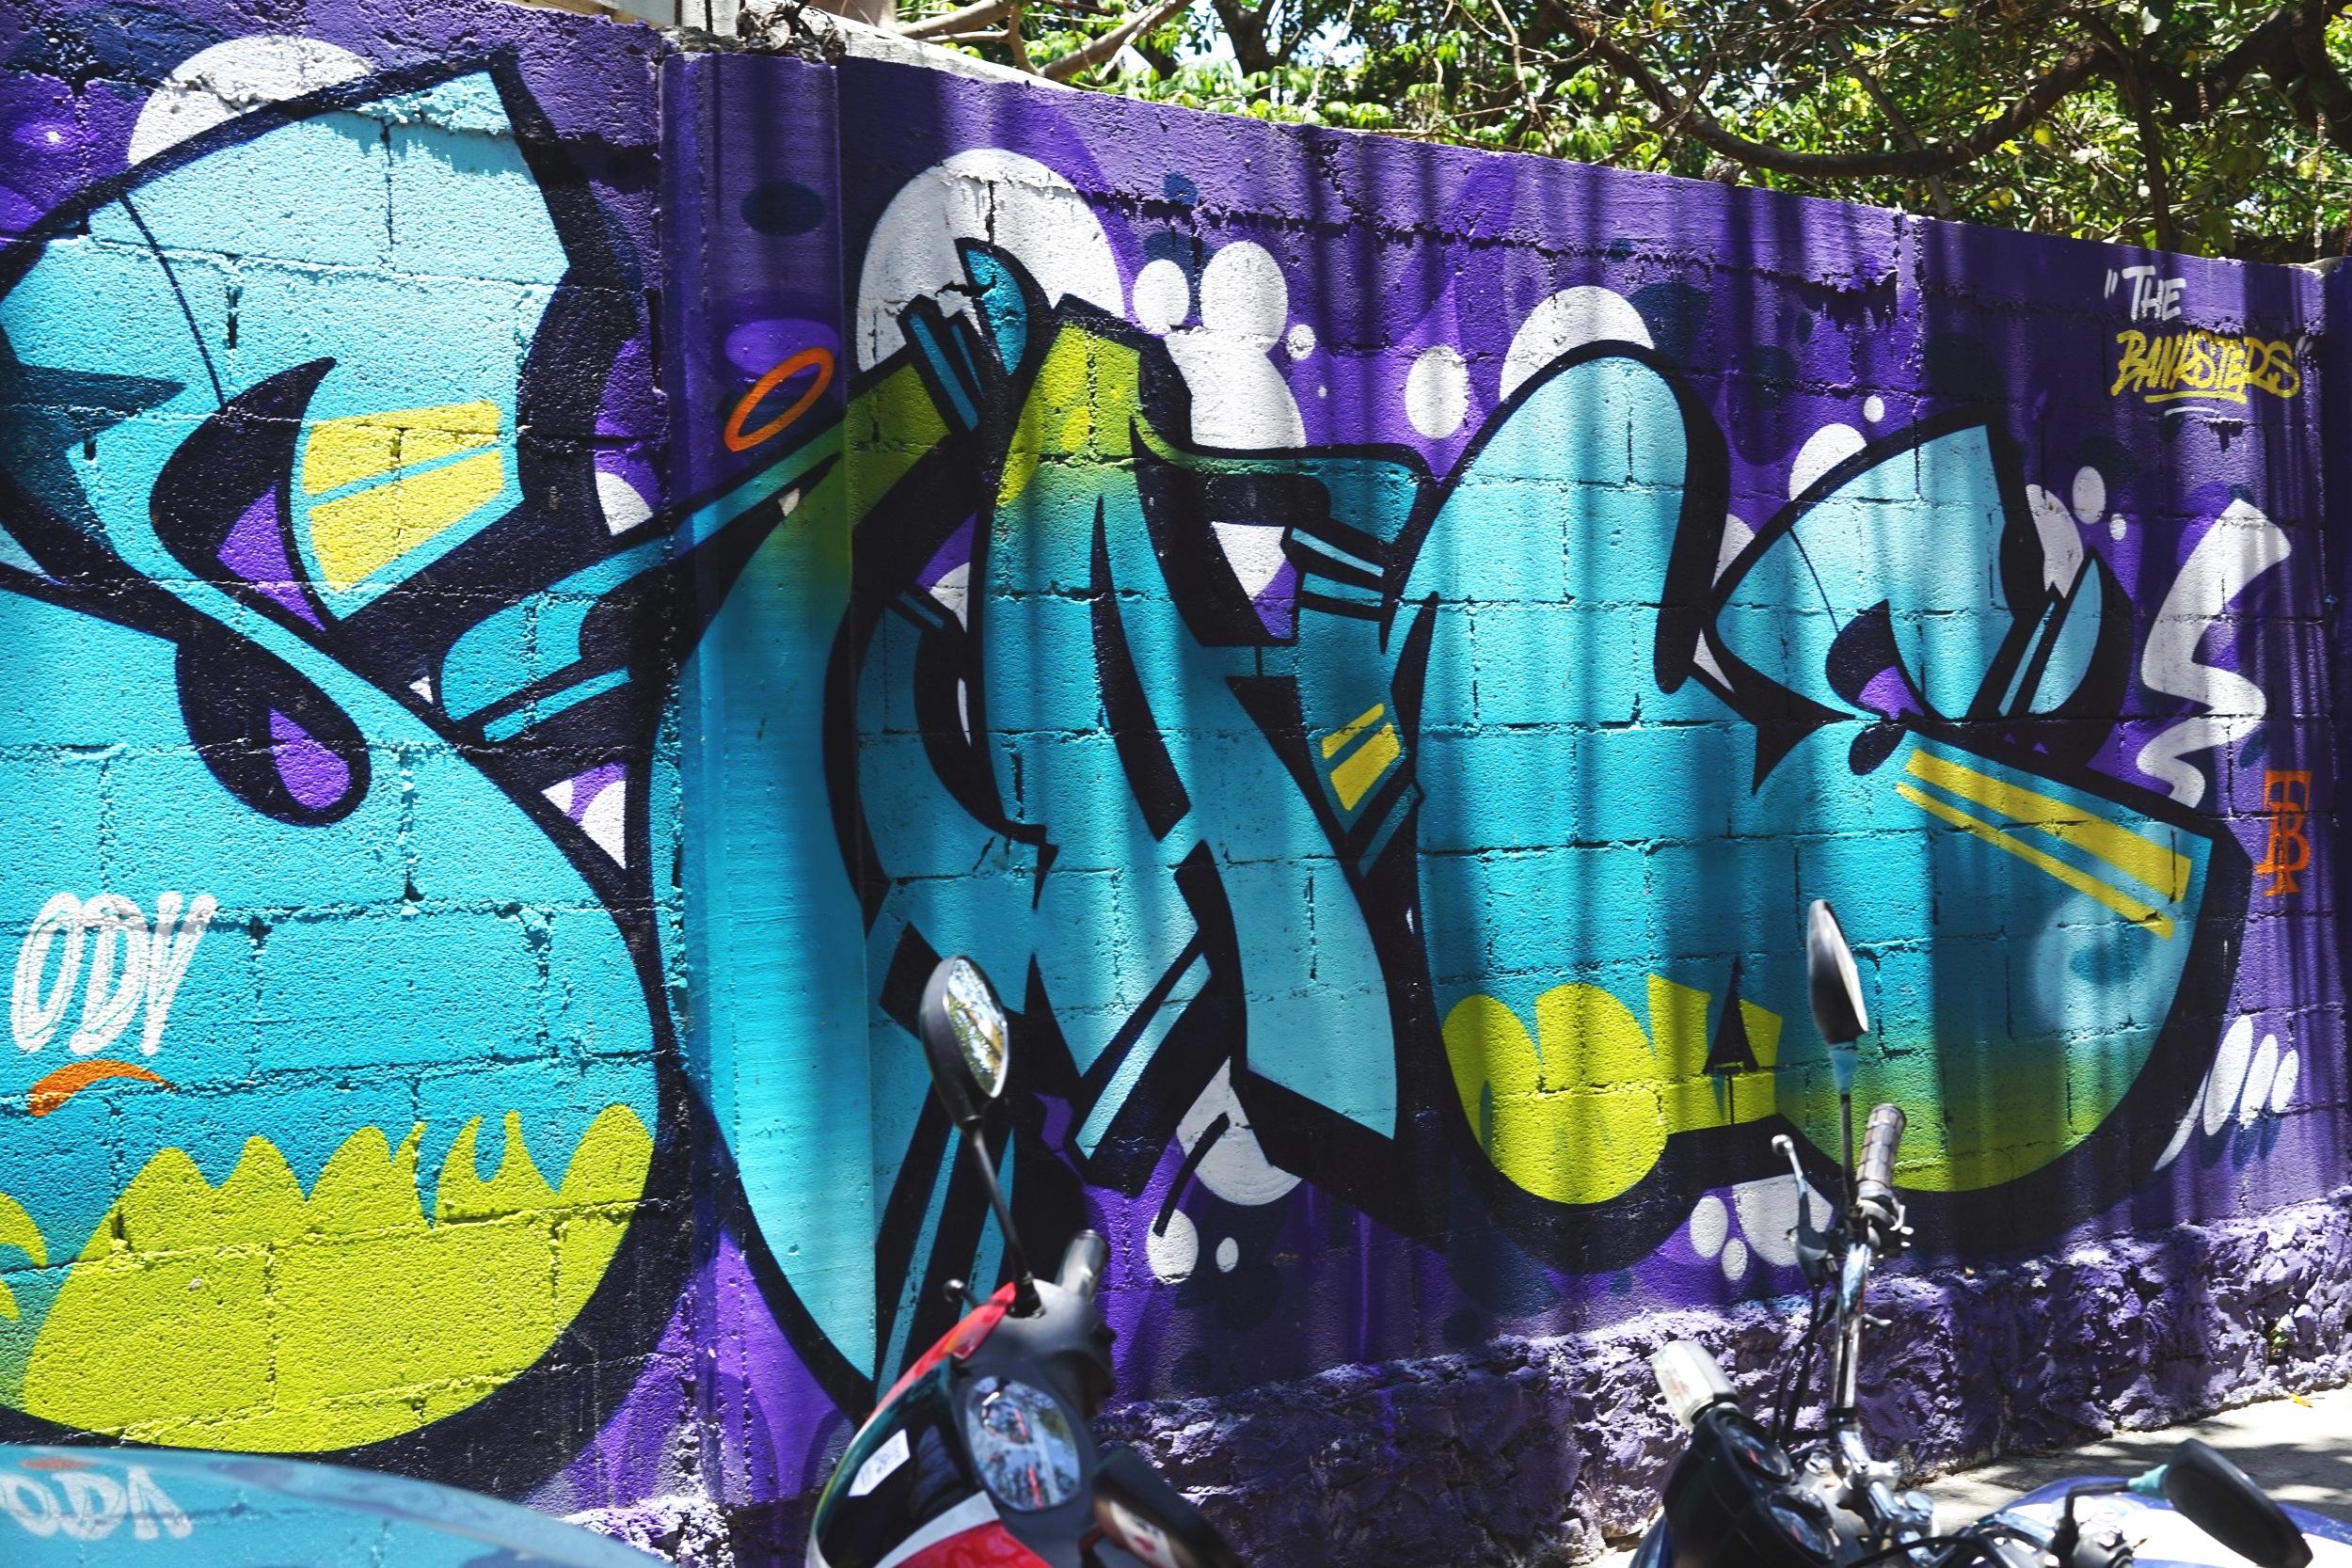 Artist The banksteps